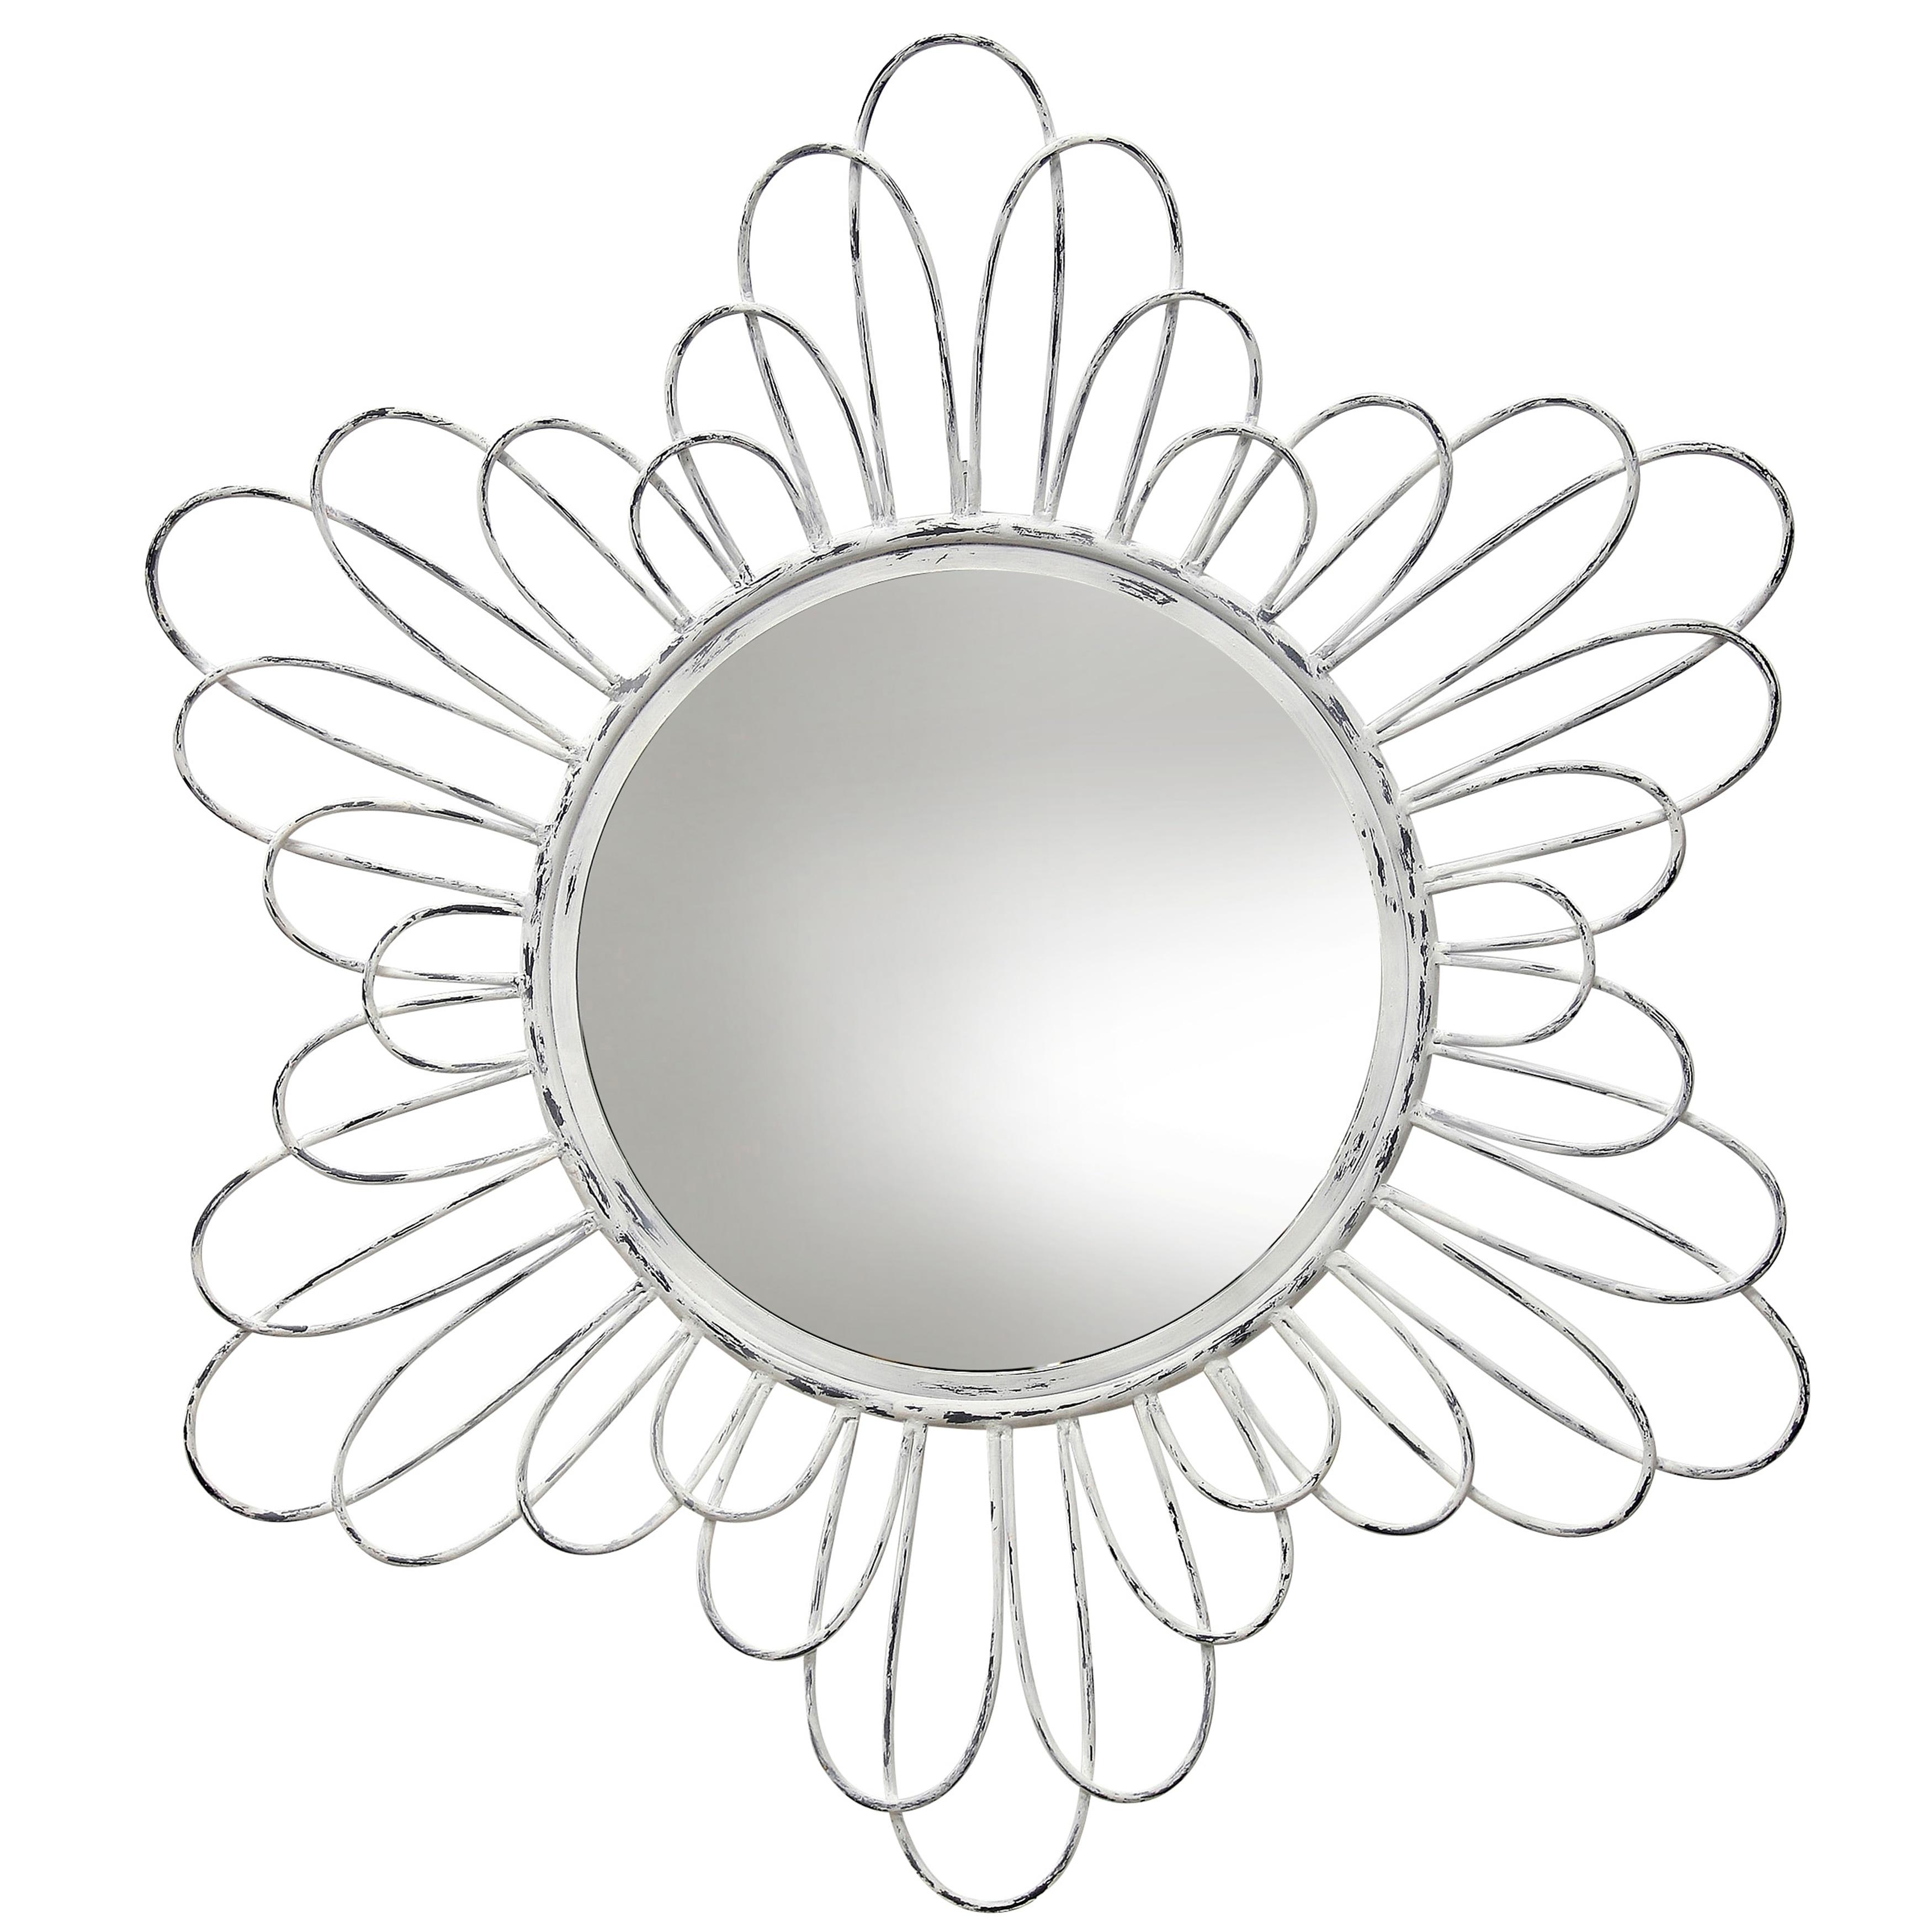 Circular Wall Mirror Framed in Metal Loops